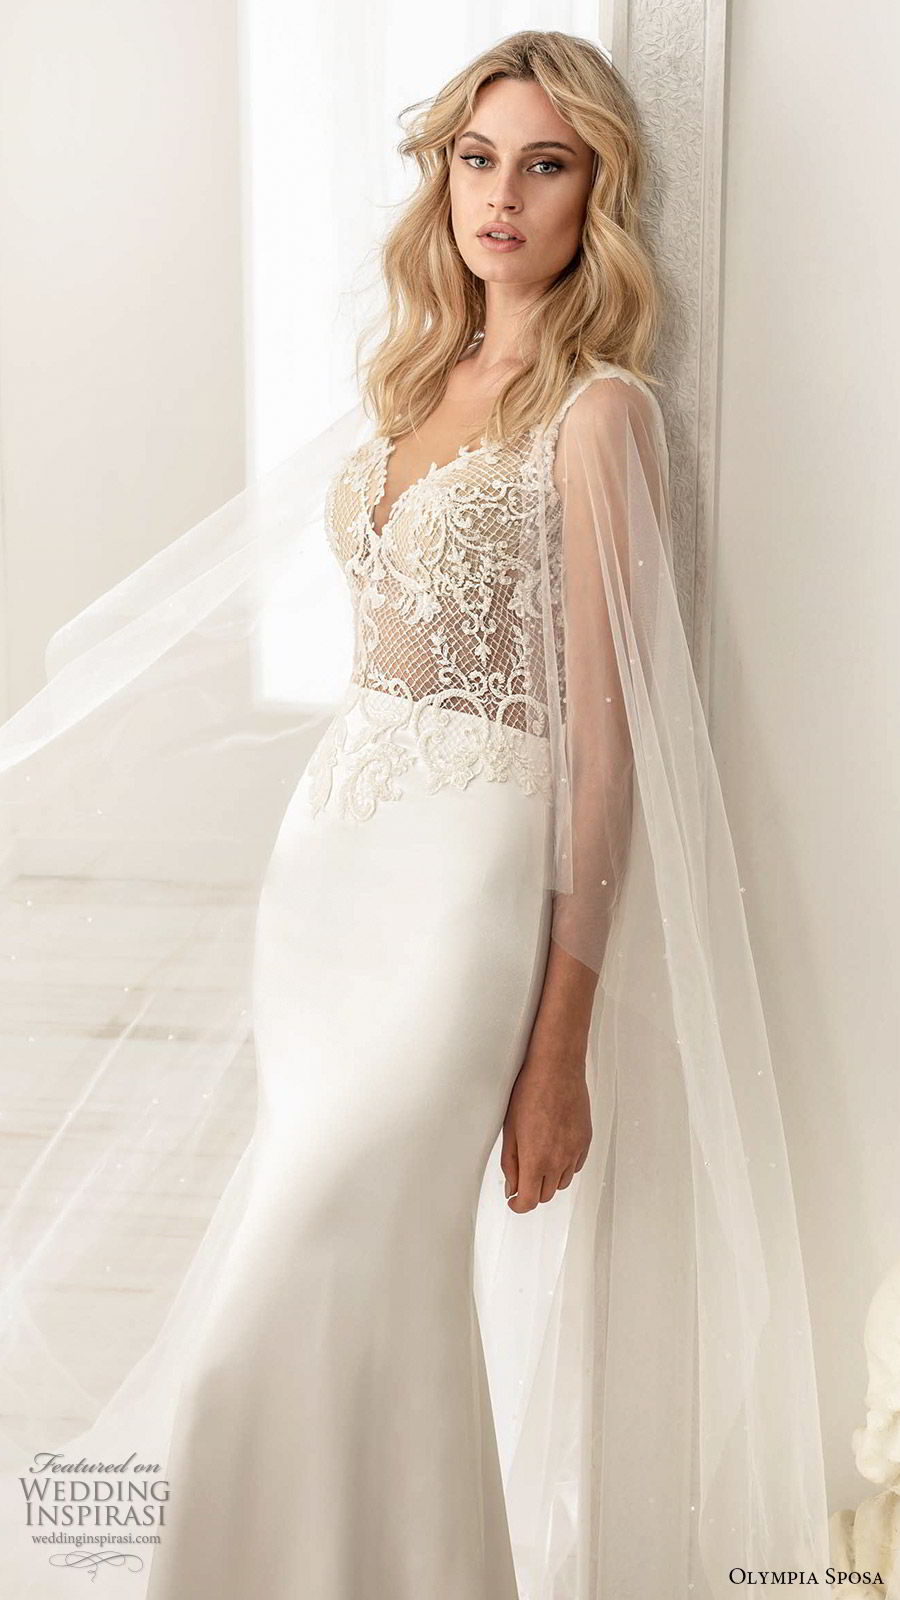 olympia sposa 2020 bridal illusion flutter sleeves sweetheart neckline embellished bodice sheath wedding dress (7) elegant romantic illusion back chapel train mv